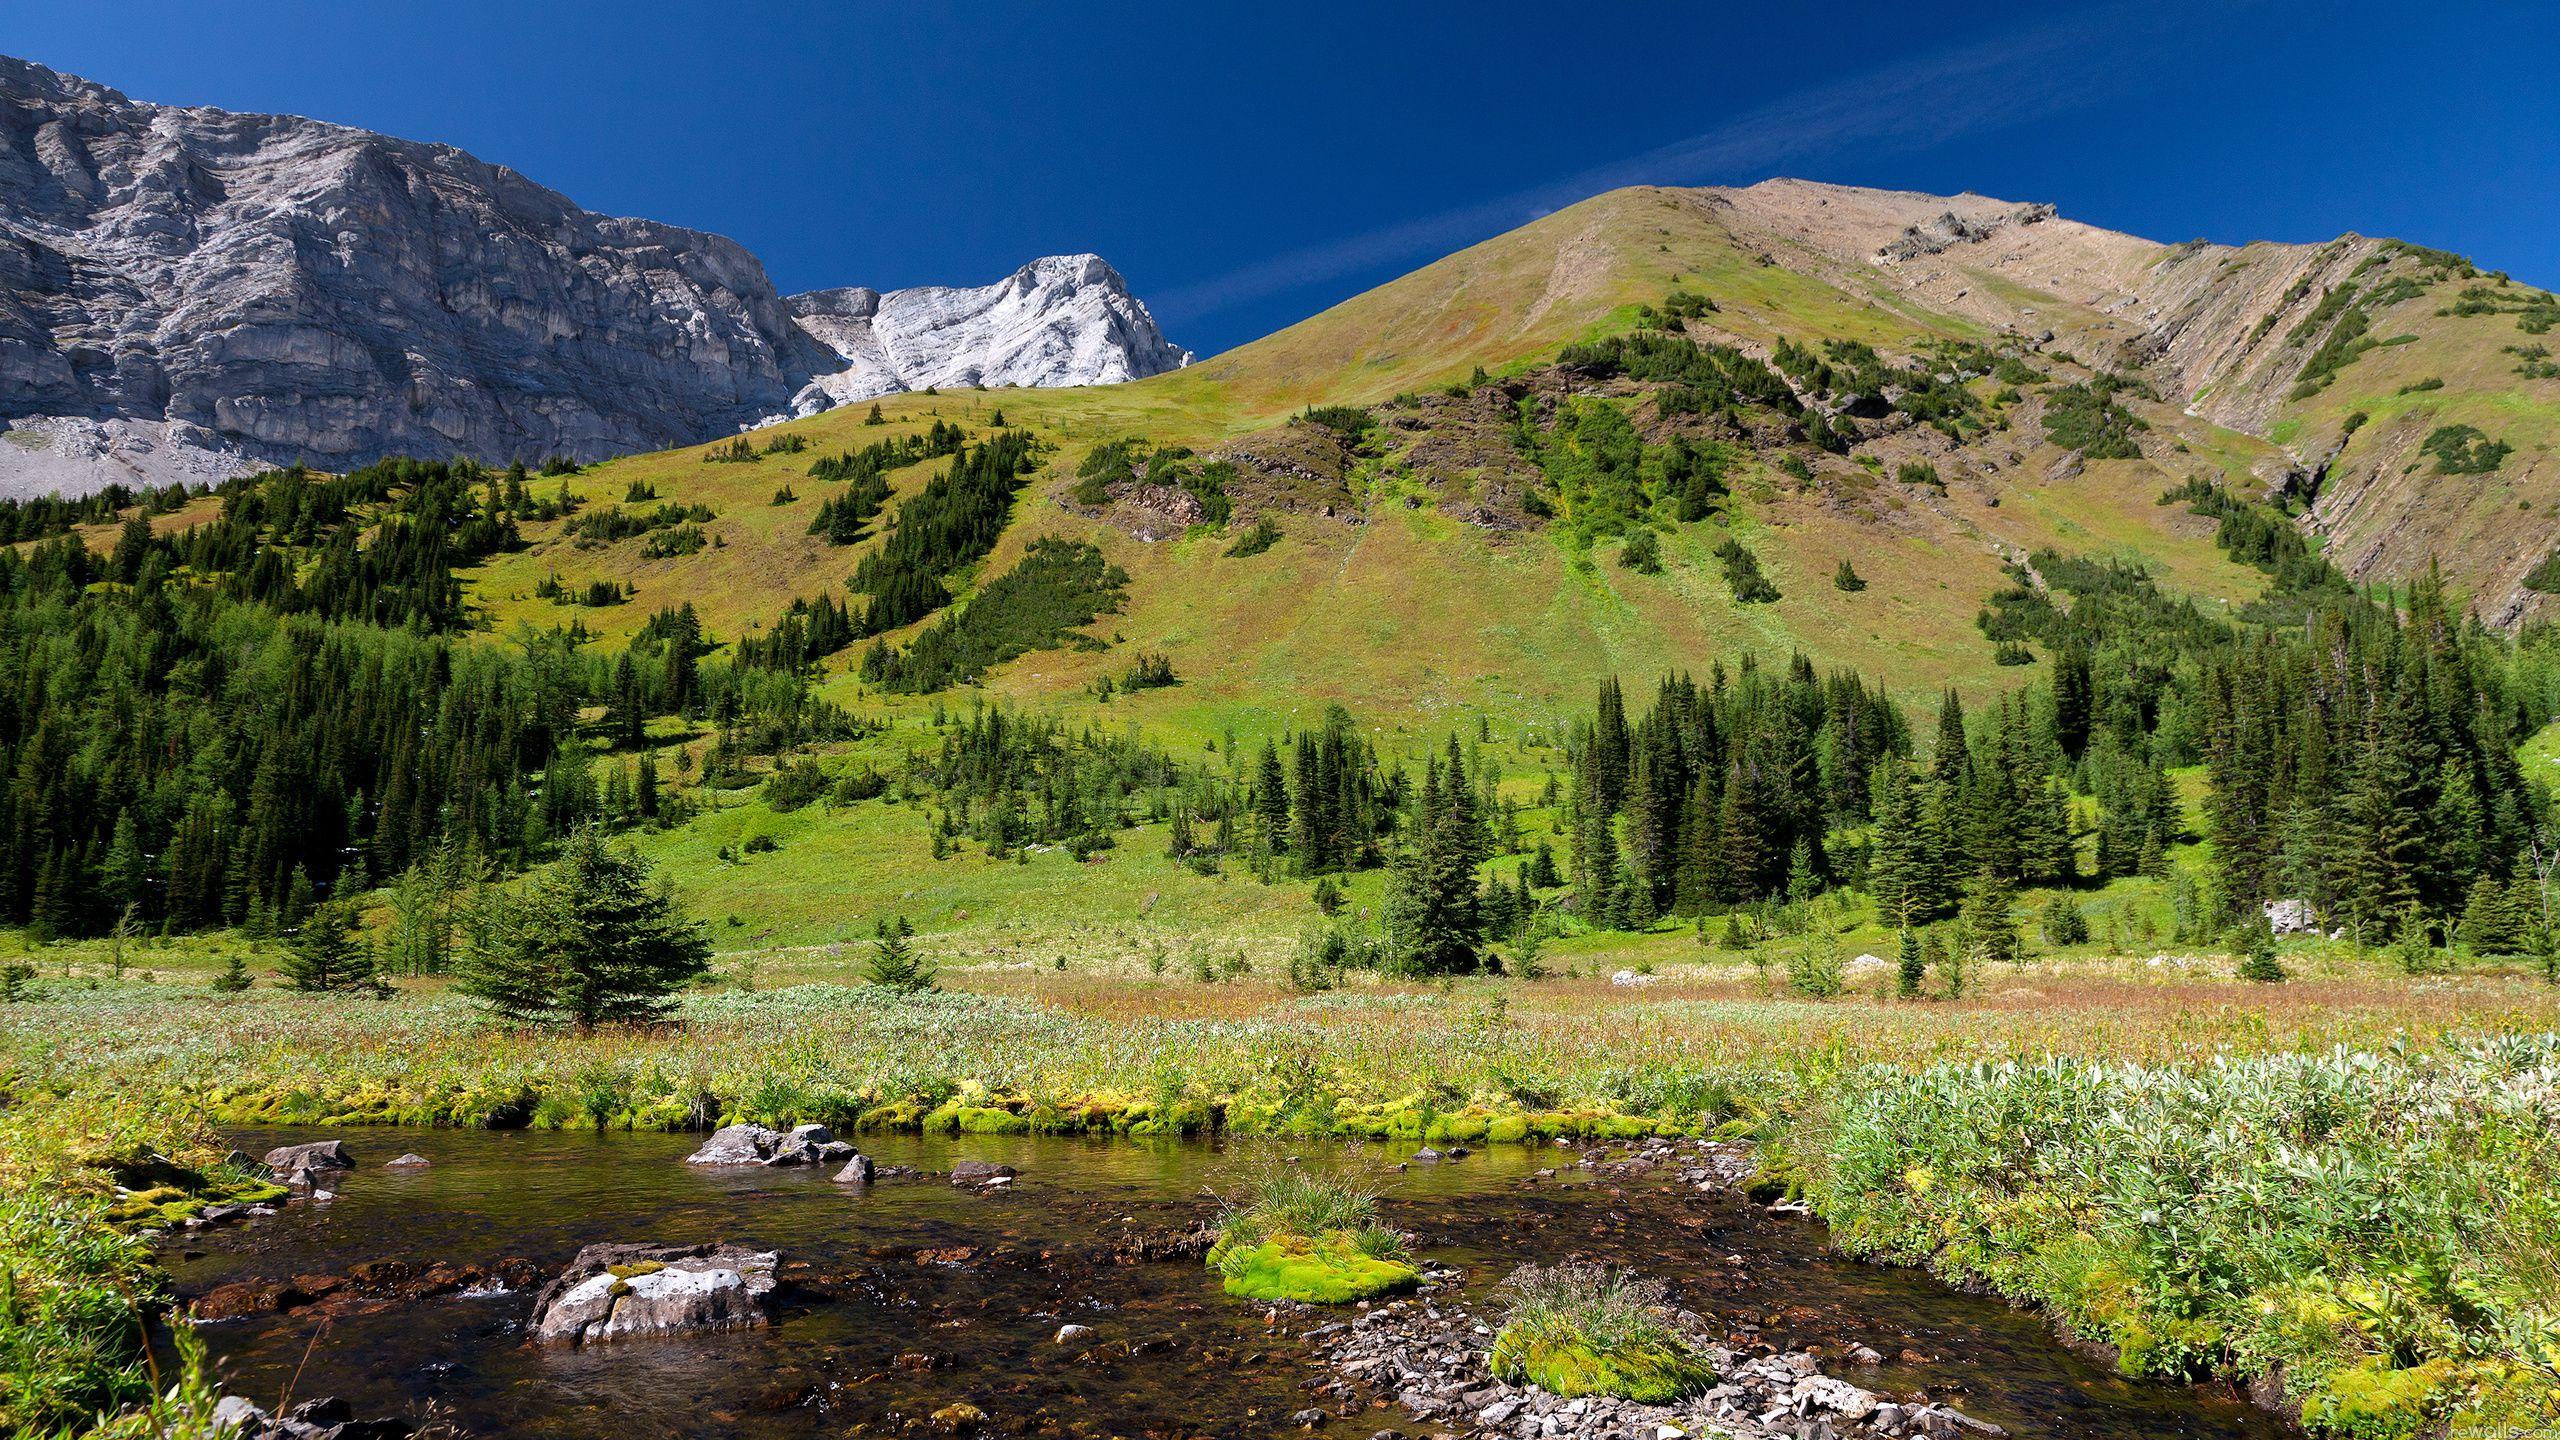 Terranatura Montagne Sfondo Paesaggi Montani Mountains